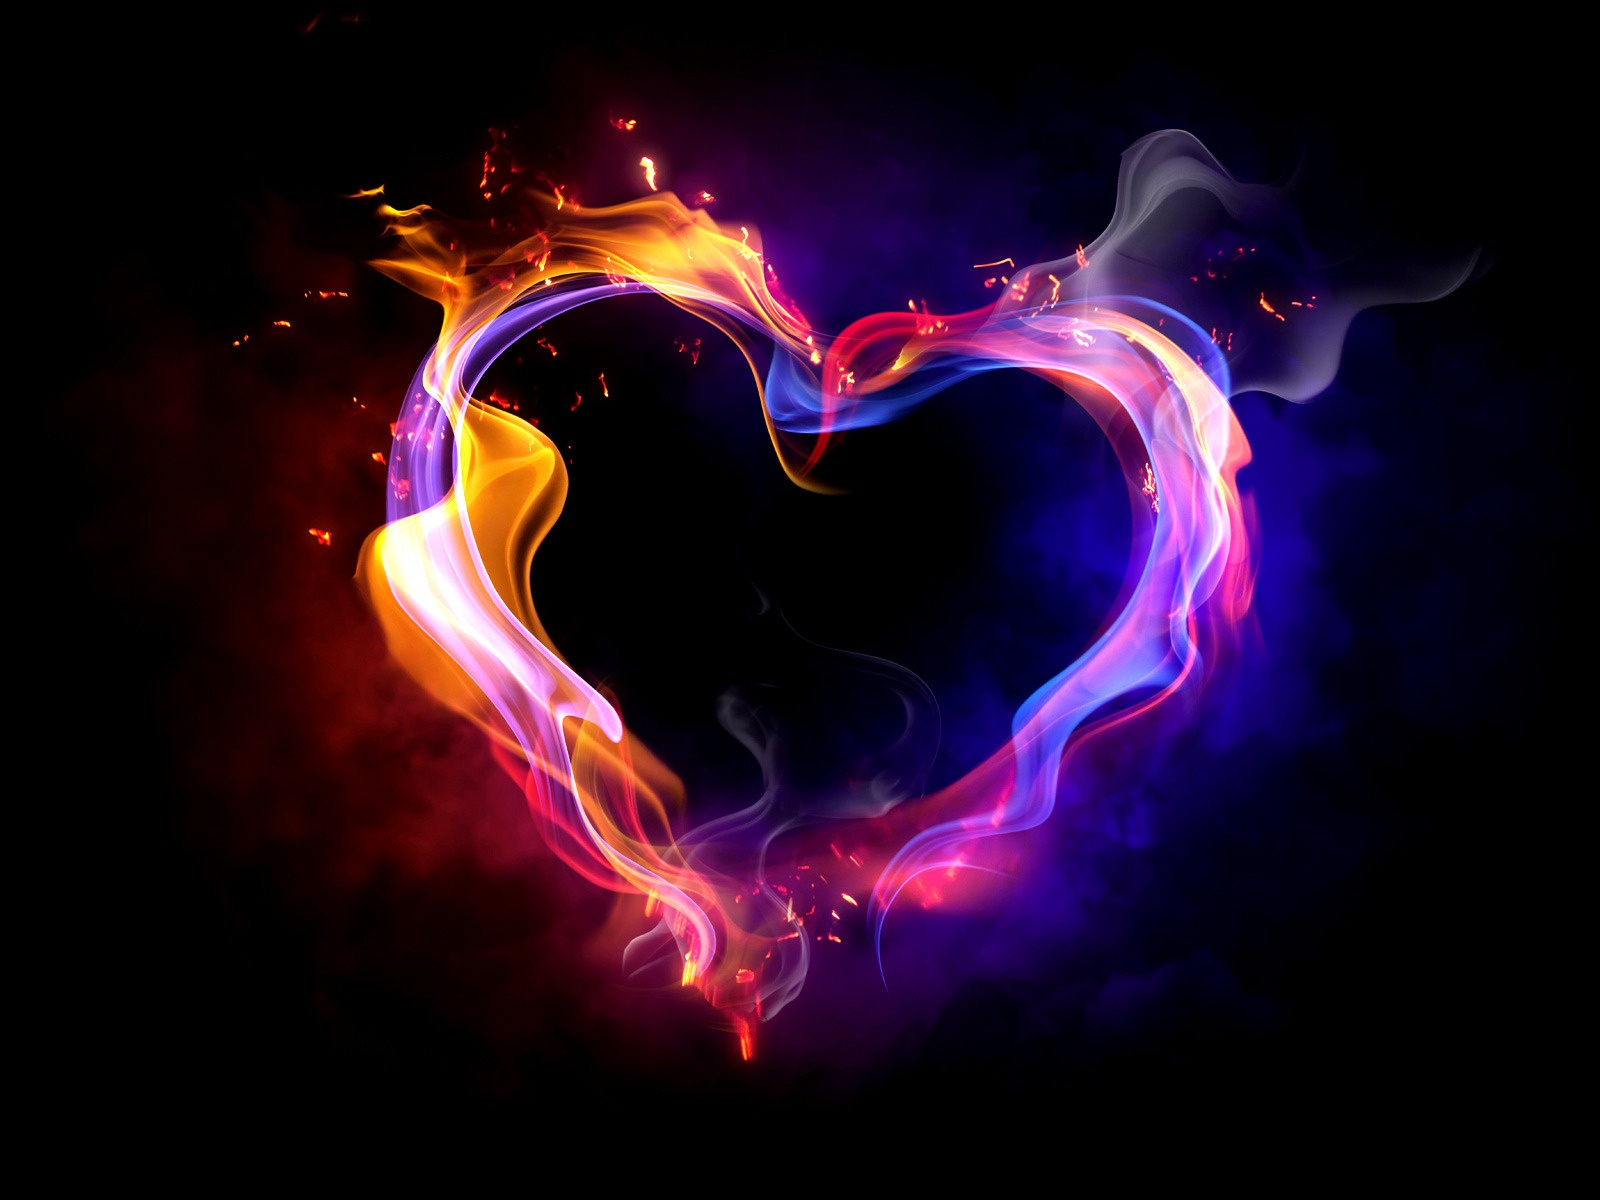 Fire-Heart-Wallpaper-HD1